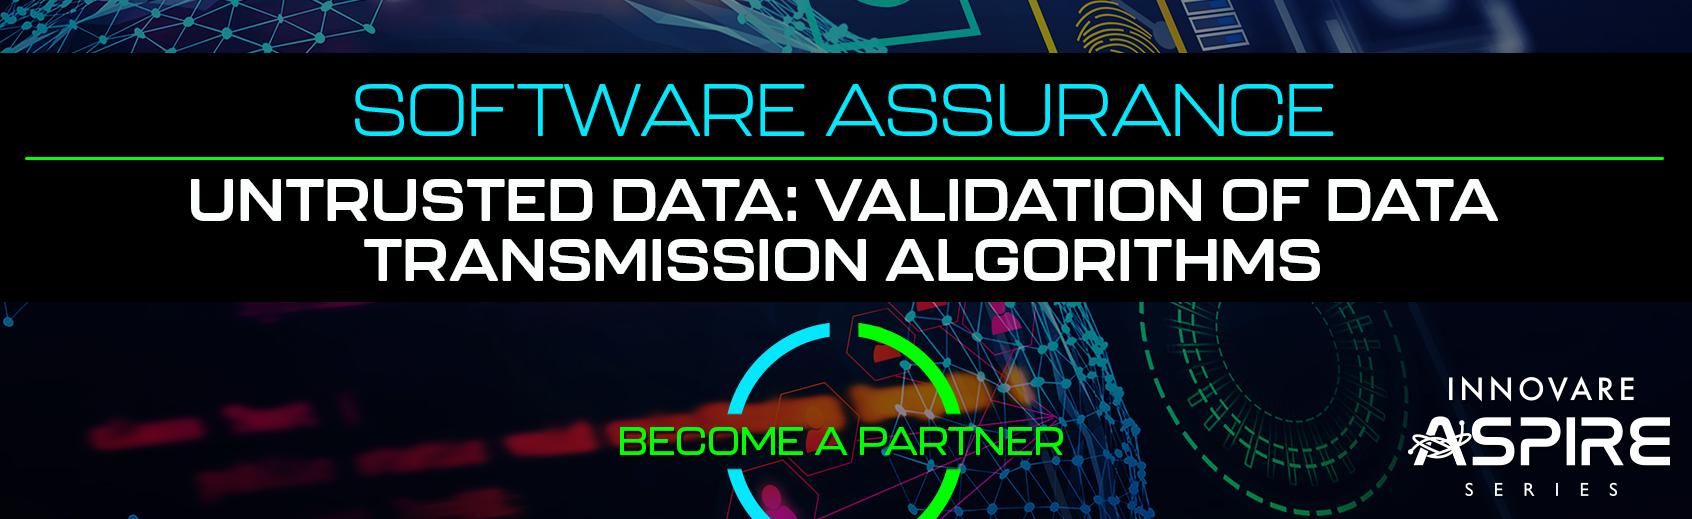 Untrusted Data: Validation of Data Transmission Algorithms